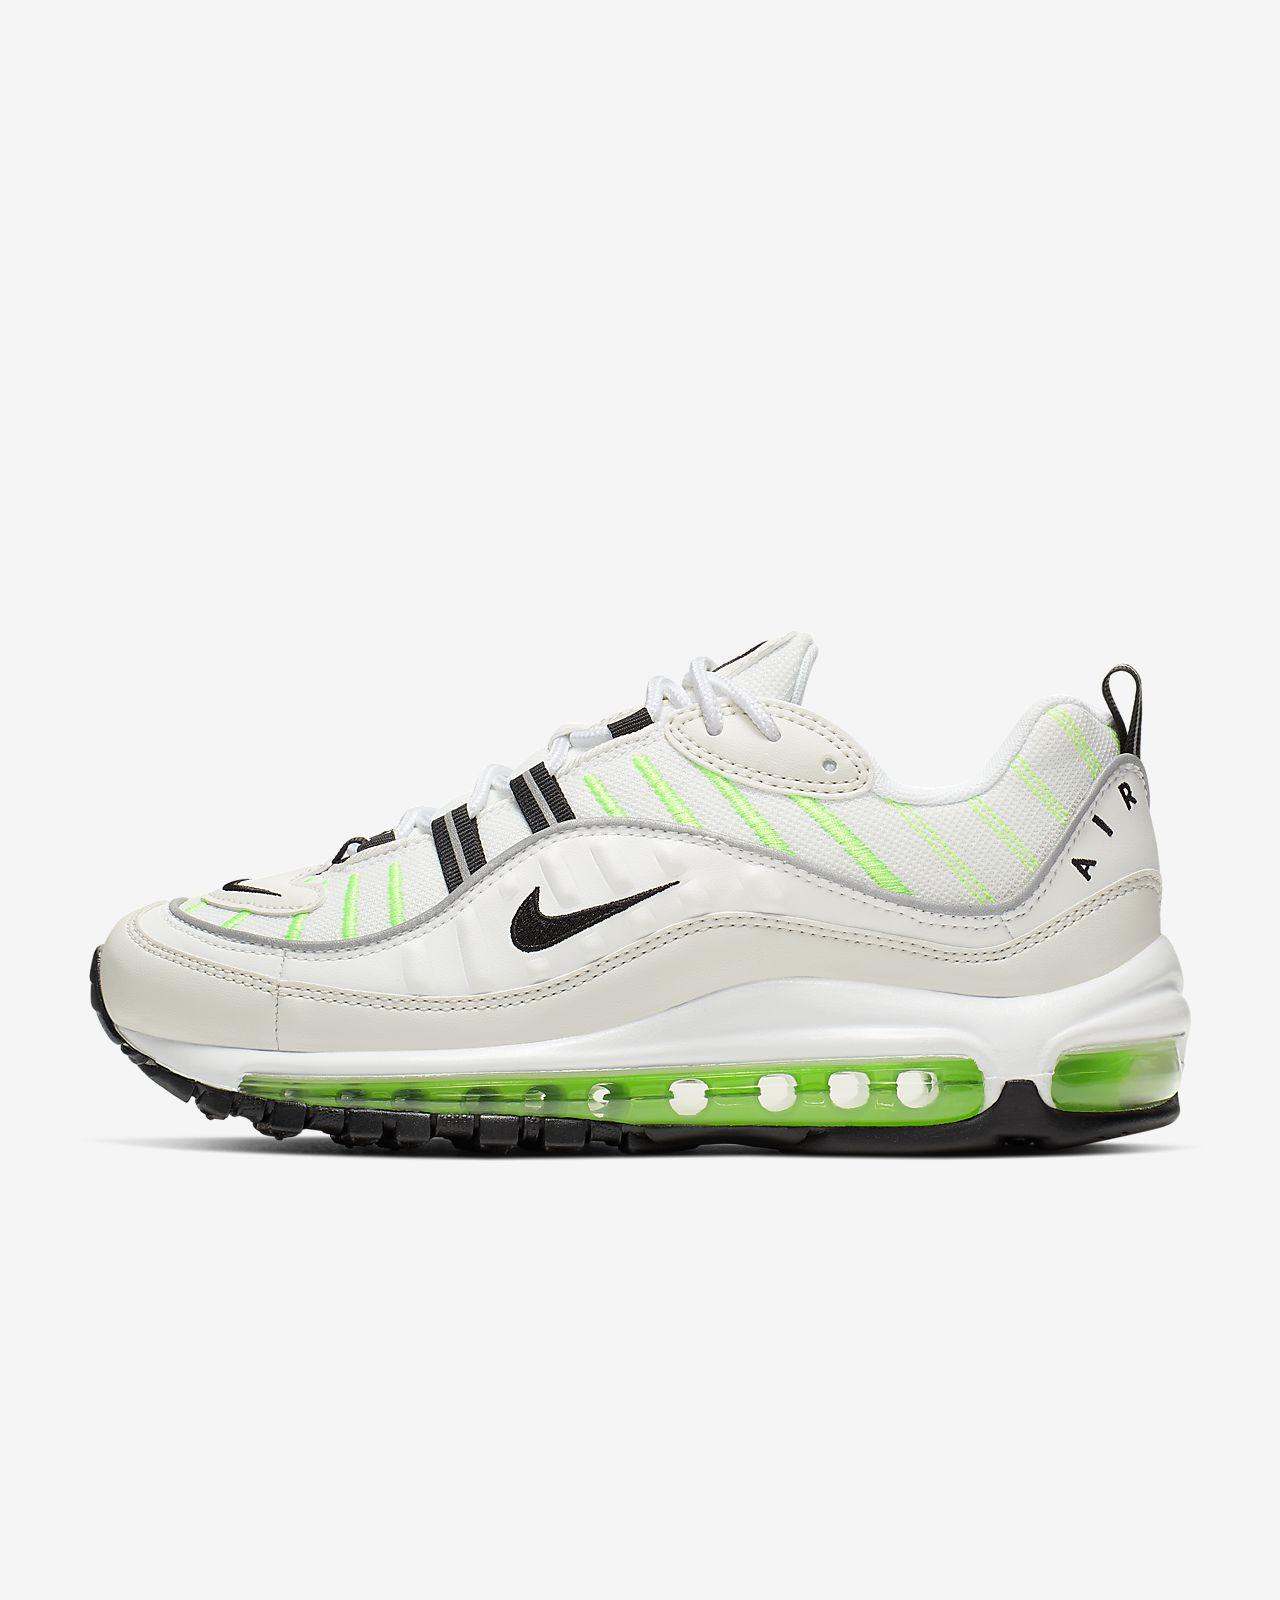 official photos 764cb d943e Nike Air Max 98 Women's Shoe